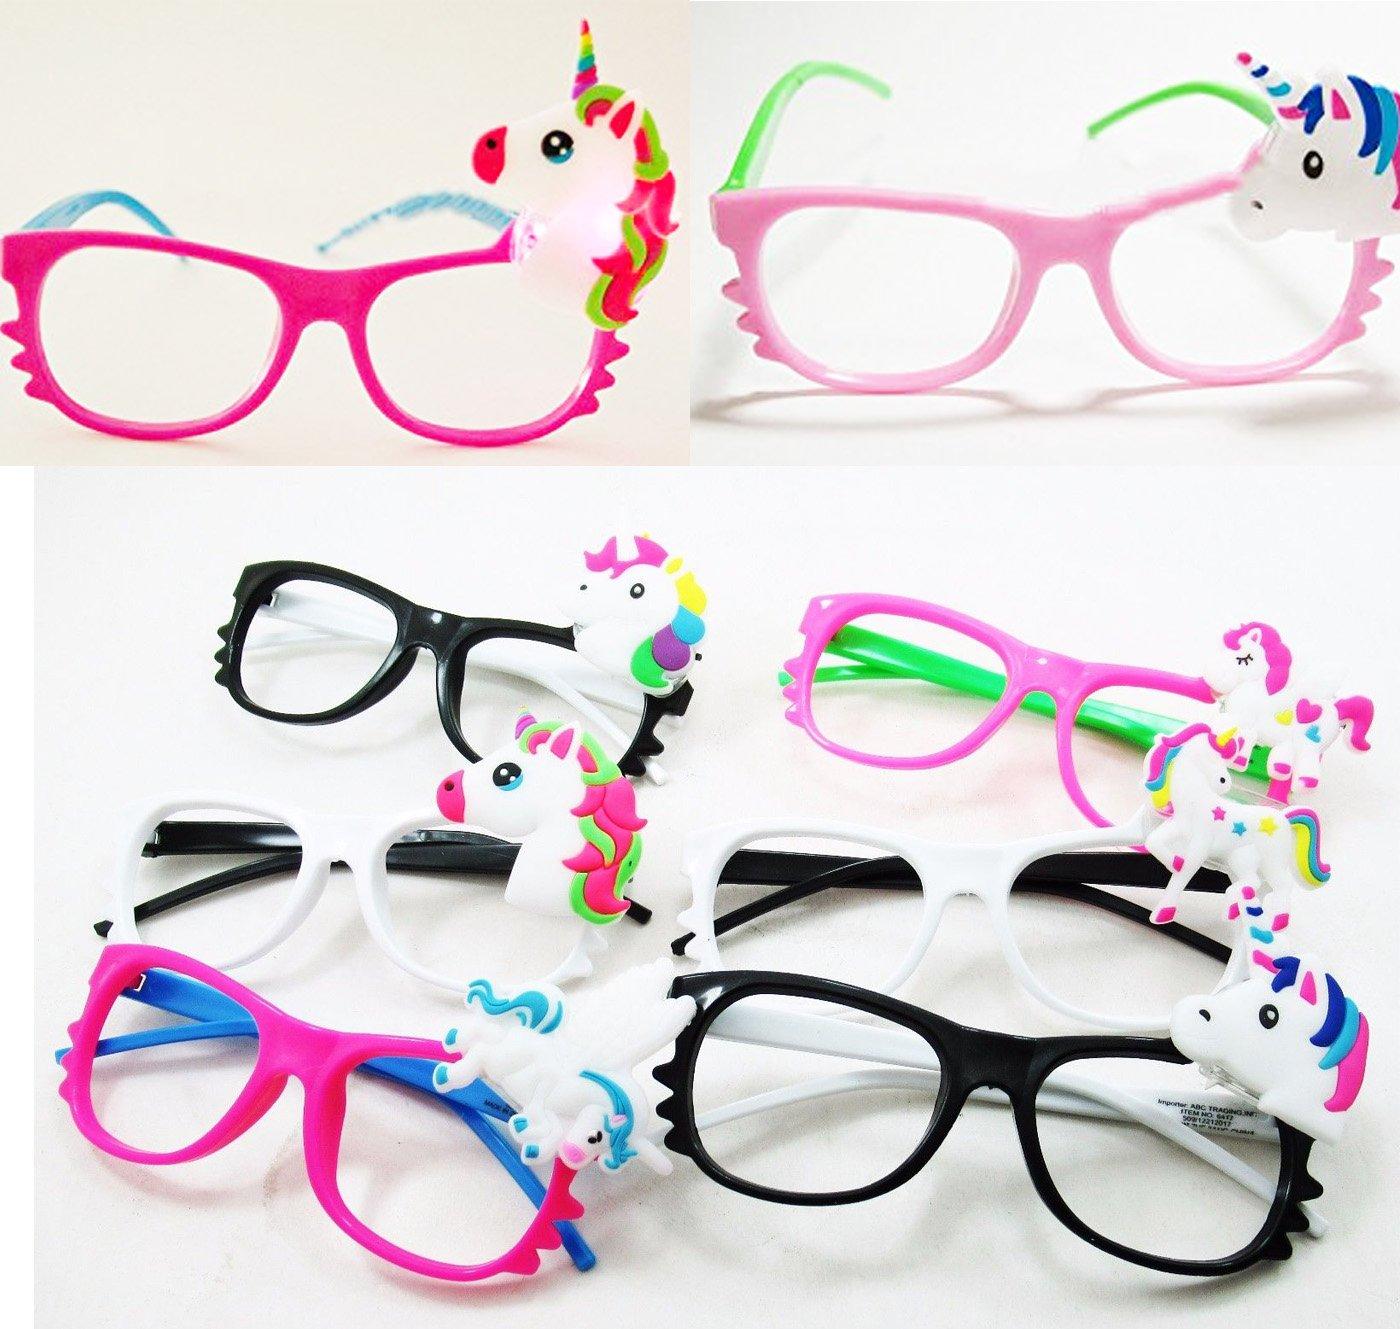 Toycamp 12/pk Flashing Lensless Assorted Unicorn Glasses LED SunGlasses Rave Party Wear